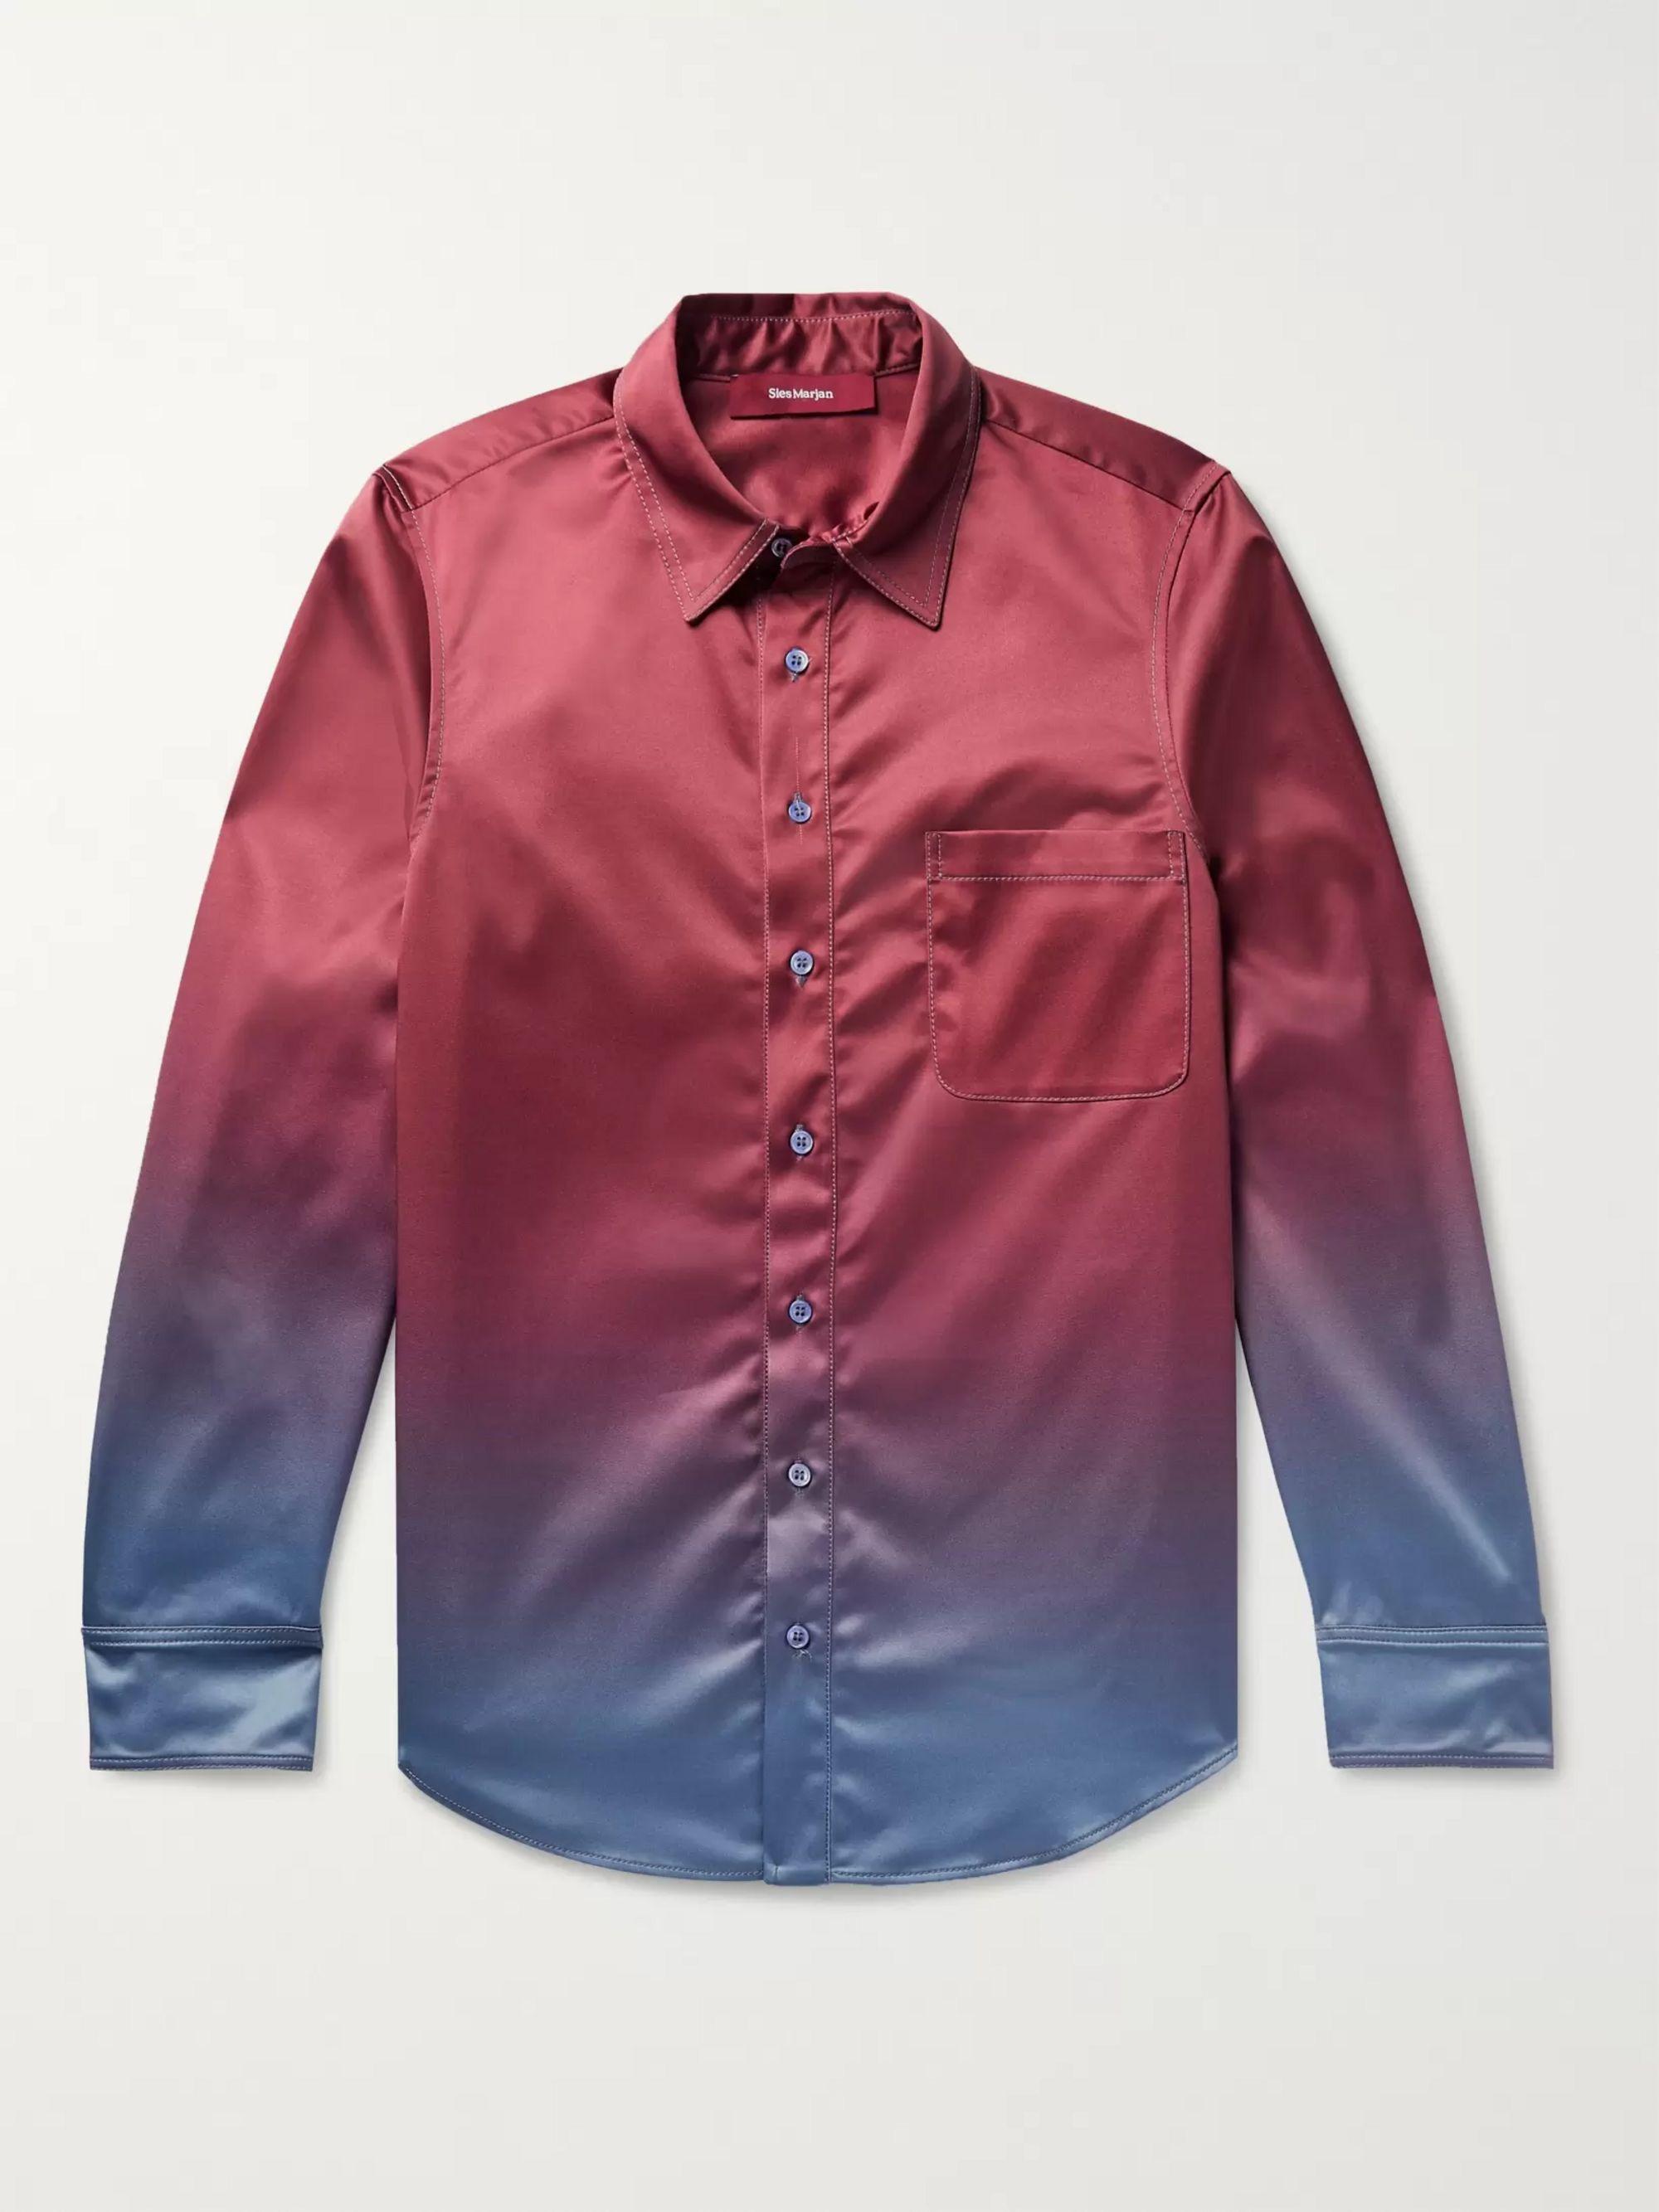 Sander Dégradé Satin Twill Shirt by Sies Marjan